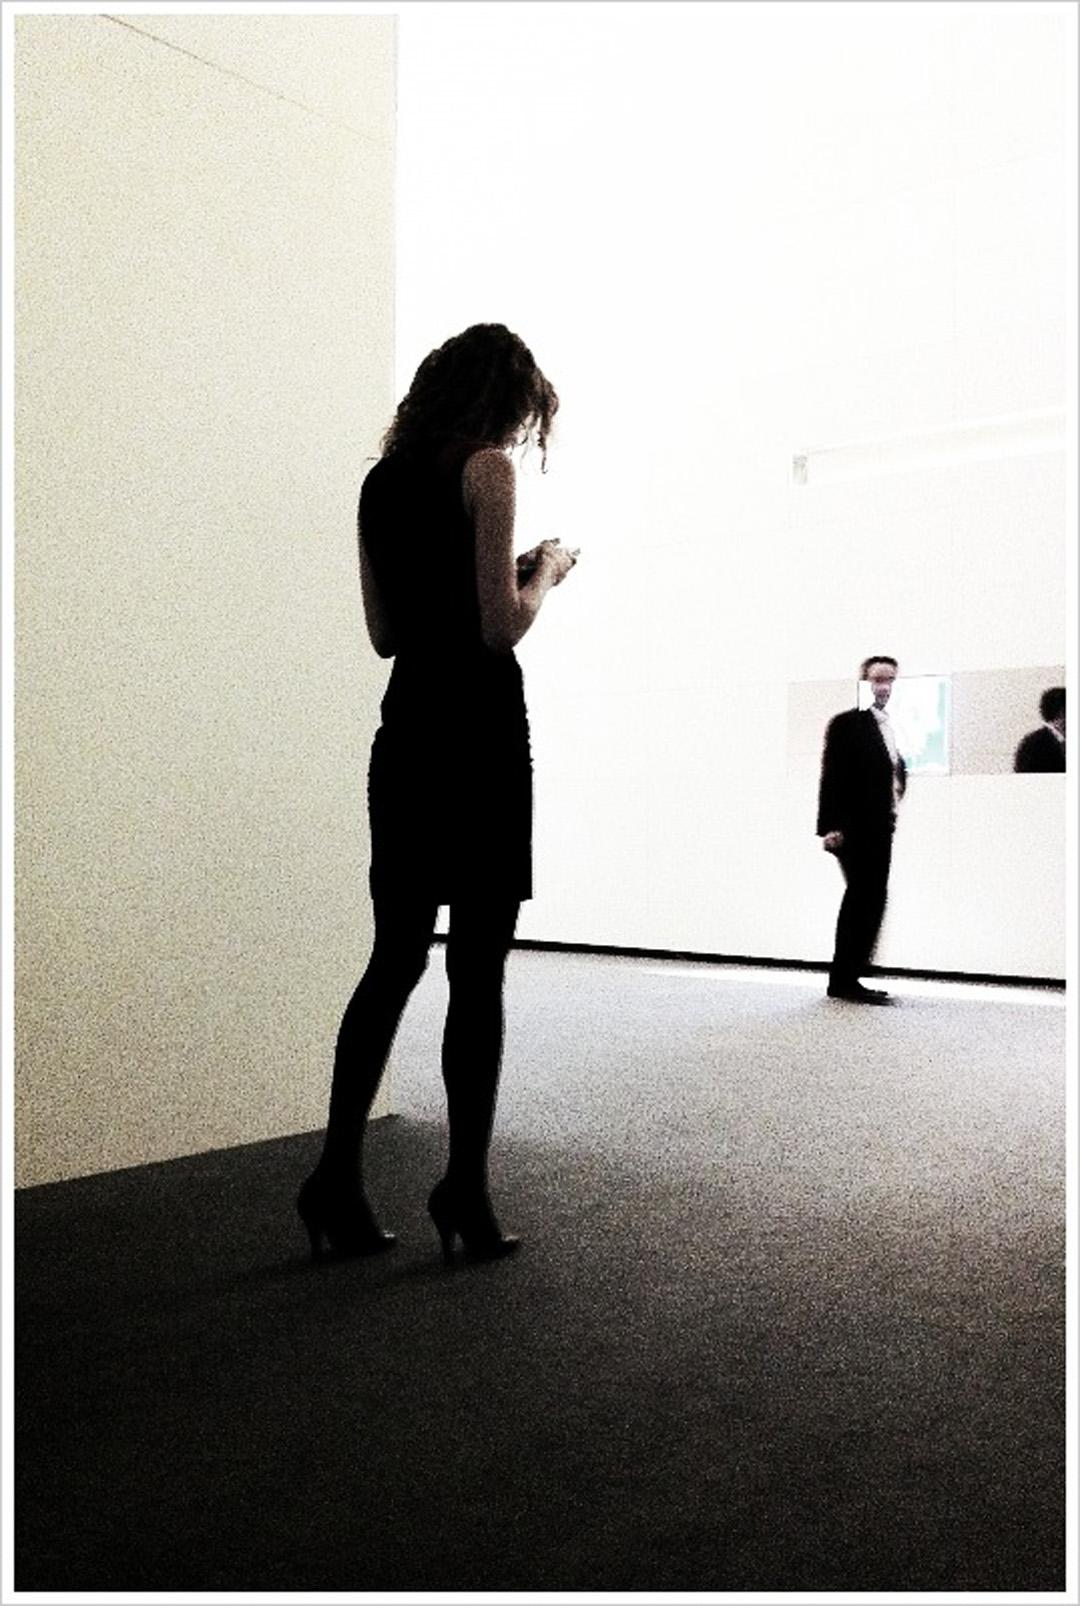 https://www.pasqualeformisano.com/wp-content/uploads/2006/09/foto-1-1.jpg